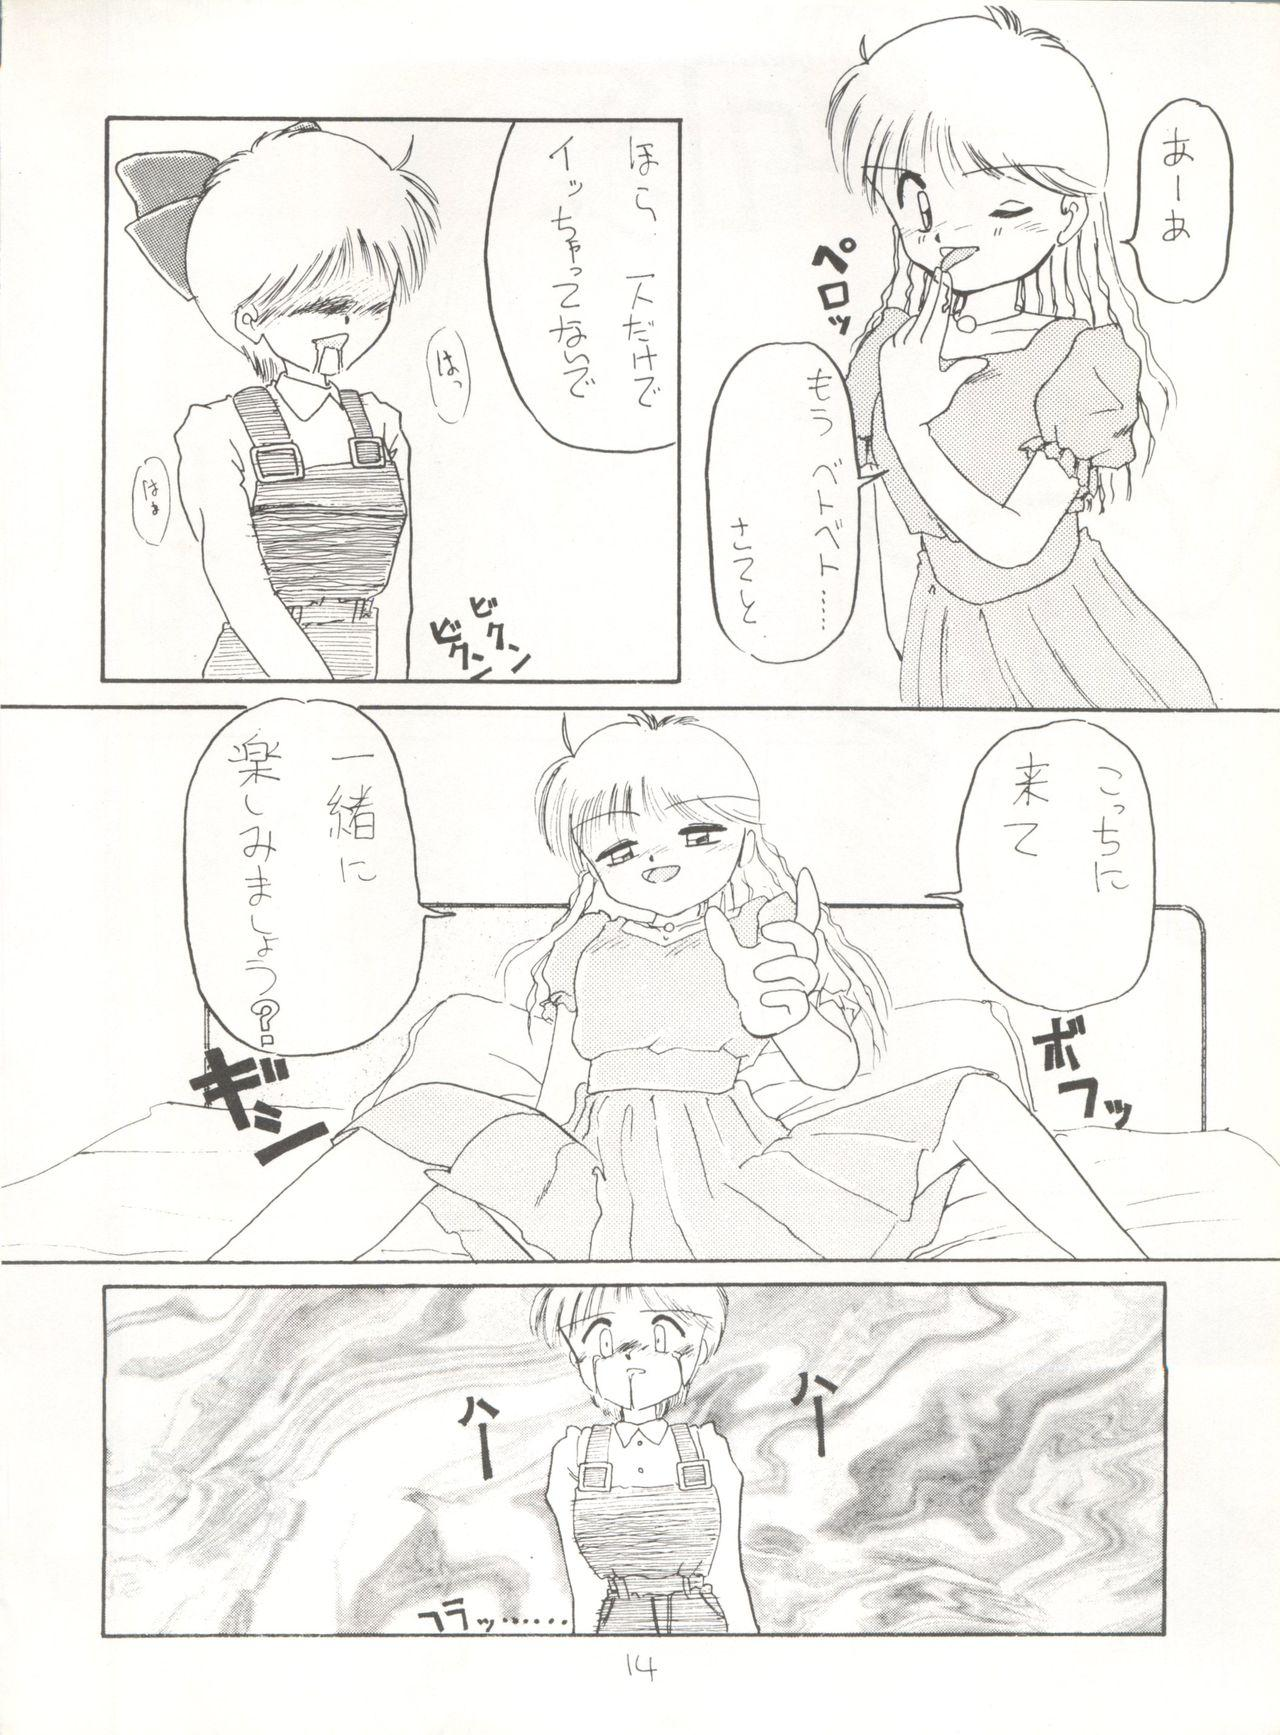 [Global One (MARO)] Sadistic 5 (Cutey Honey, Devilman, Sailor Moon), [Global One (MARO)] Sadistic (Dirty Pair, Fushigi no Umi no Nadia, Sailor Moon), [Studio Ikkatsumajin] .ribbon (Hime-chan's Ribbon) 137